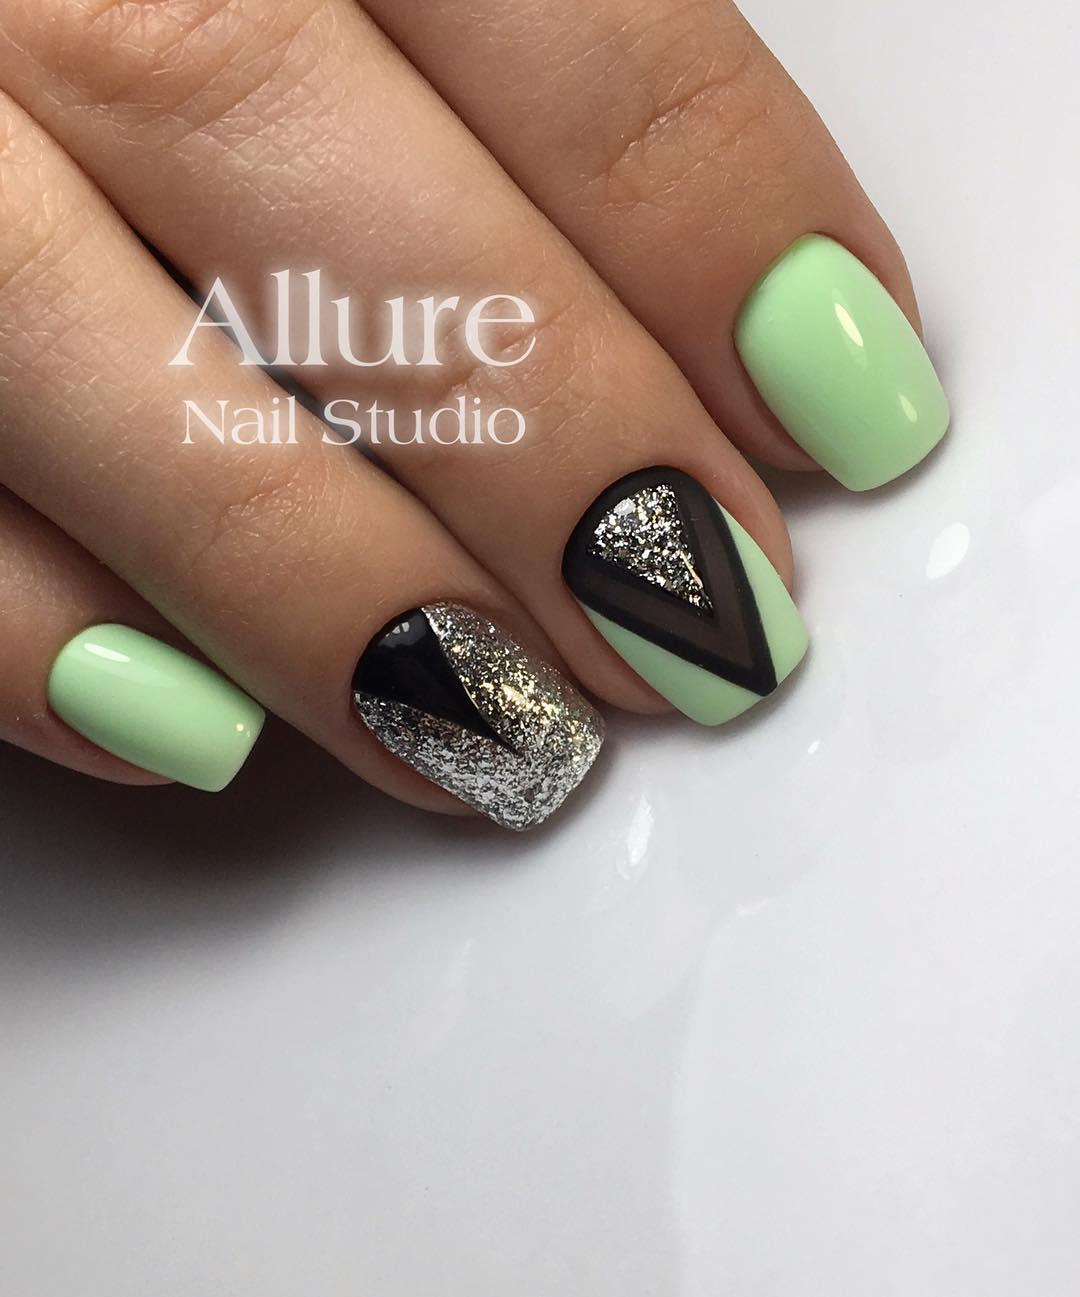 allure_nail_studio-4-копия.jpg